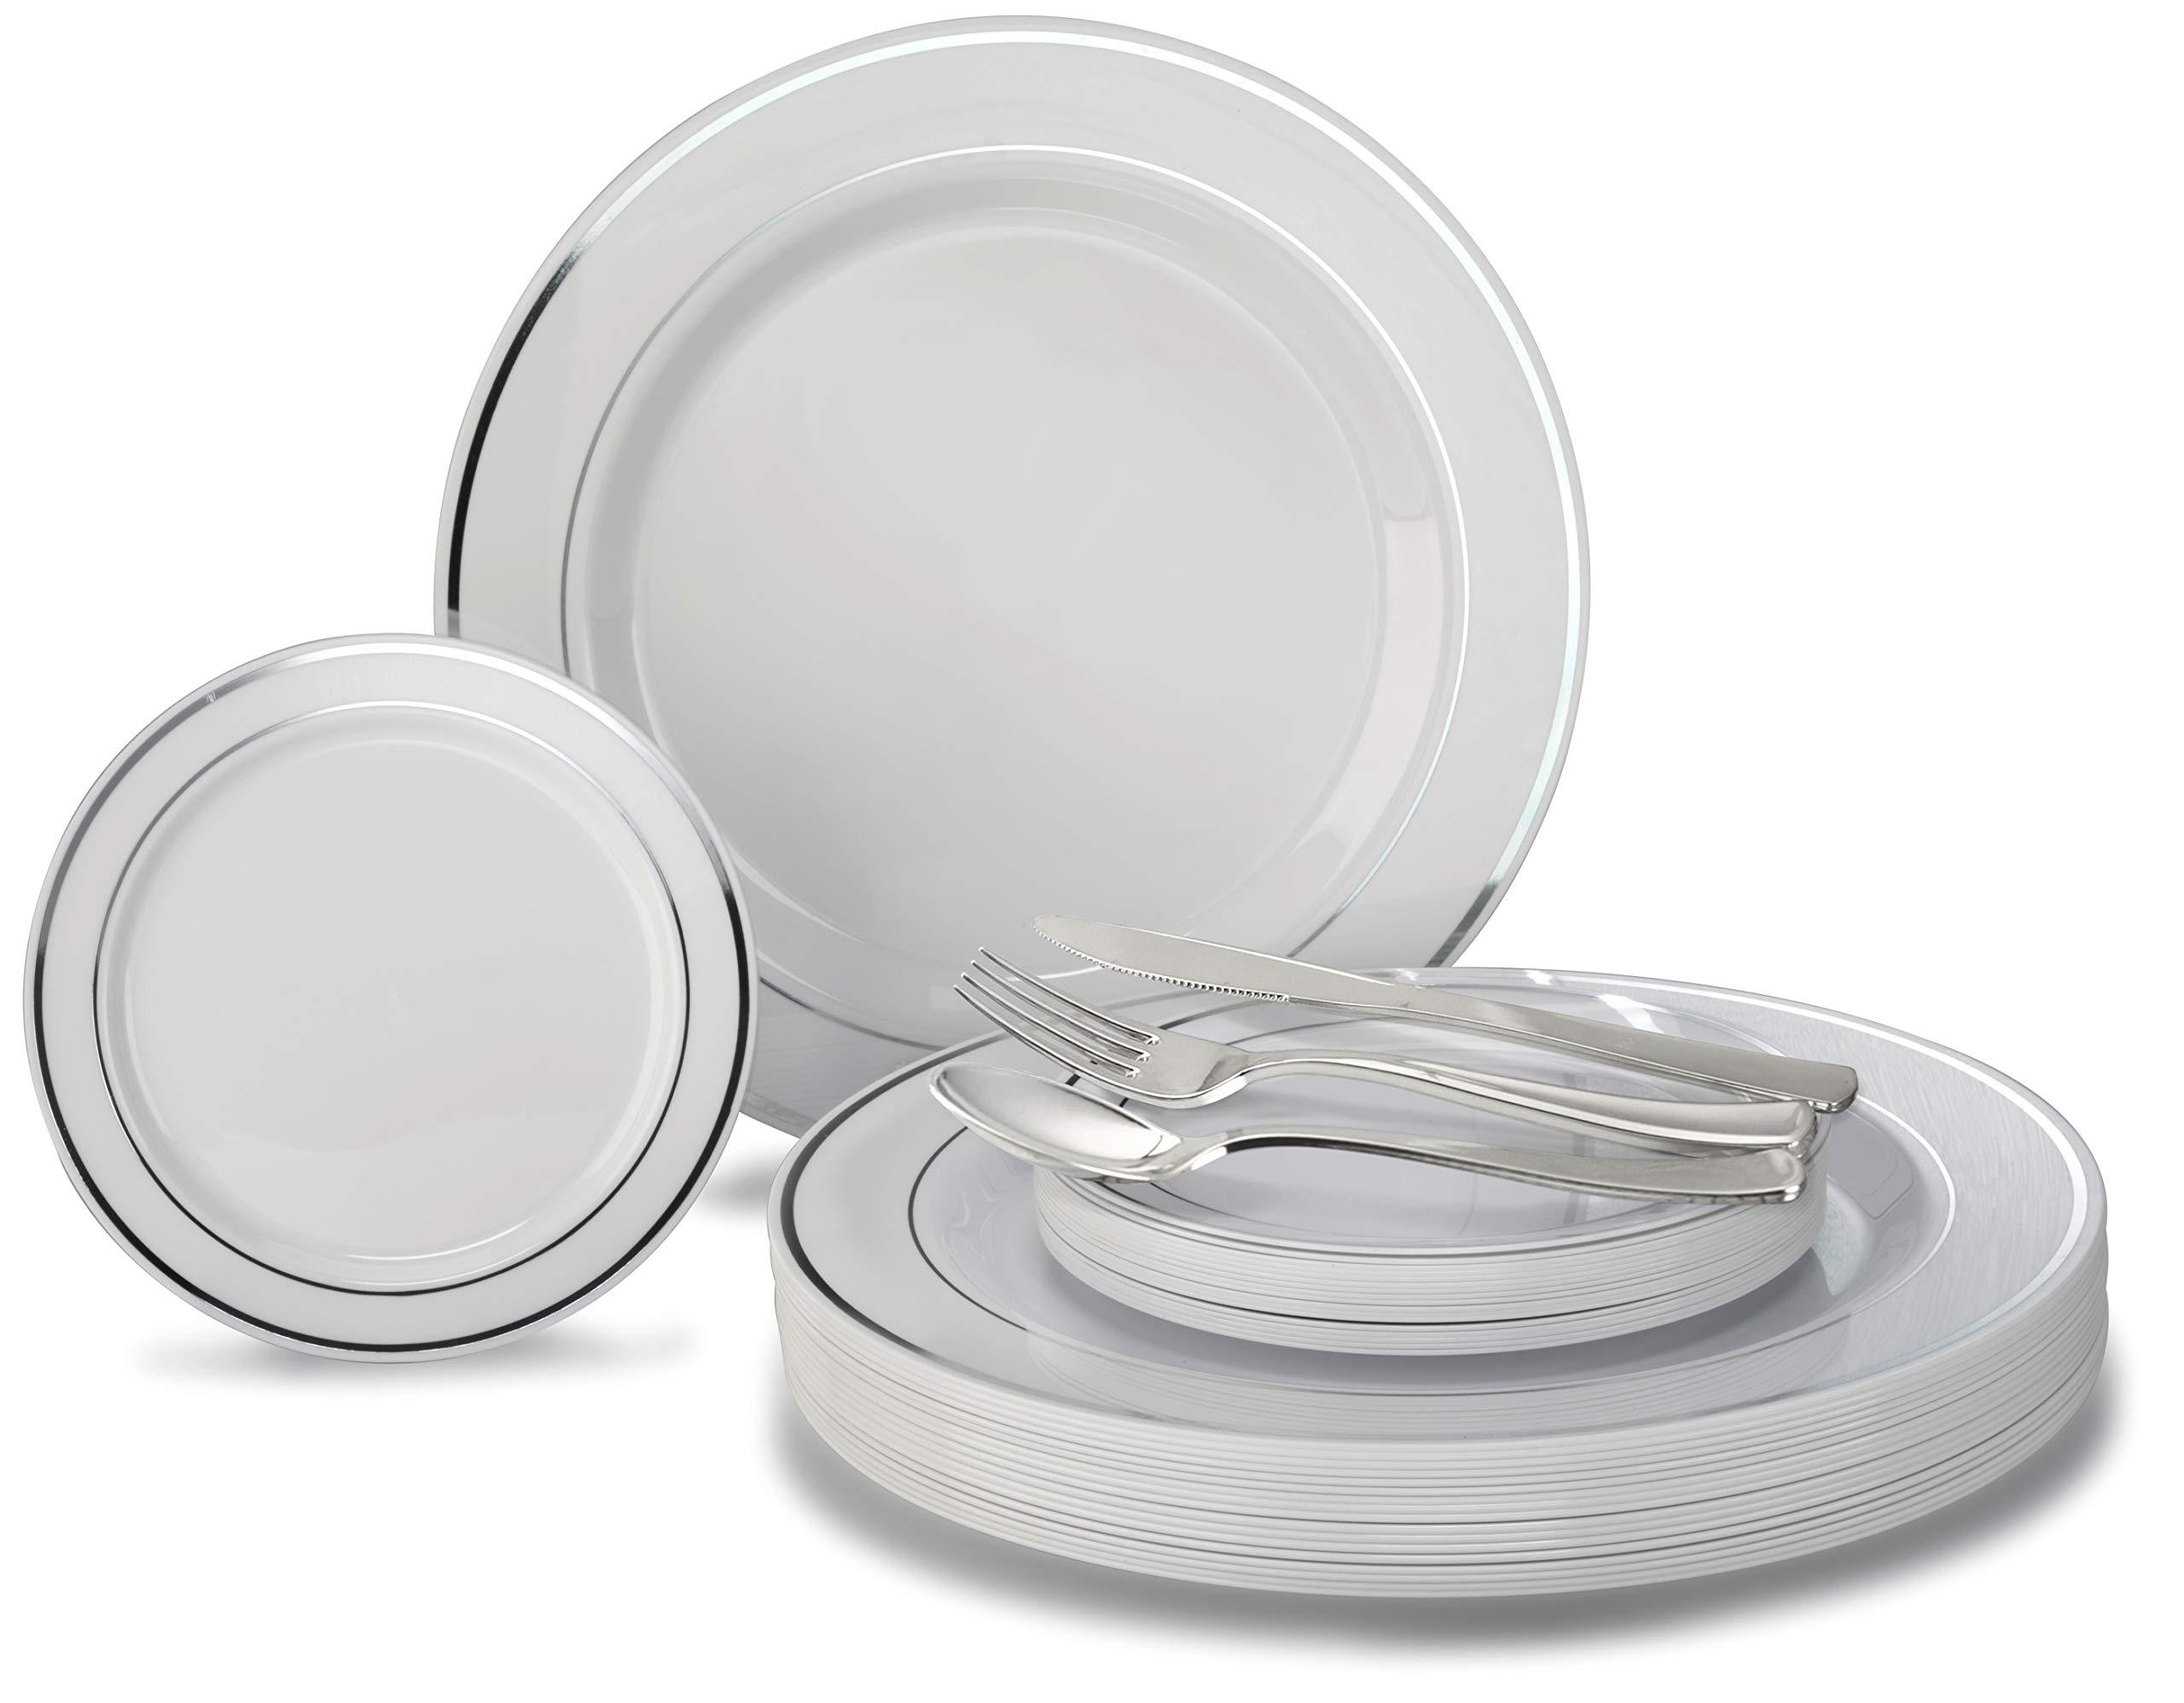 Best Plastic Plates For Wedding Amazon